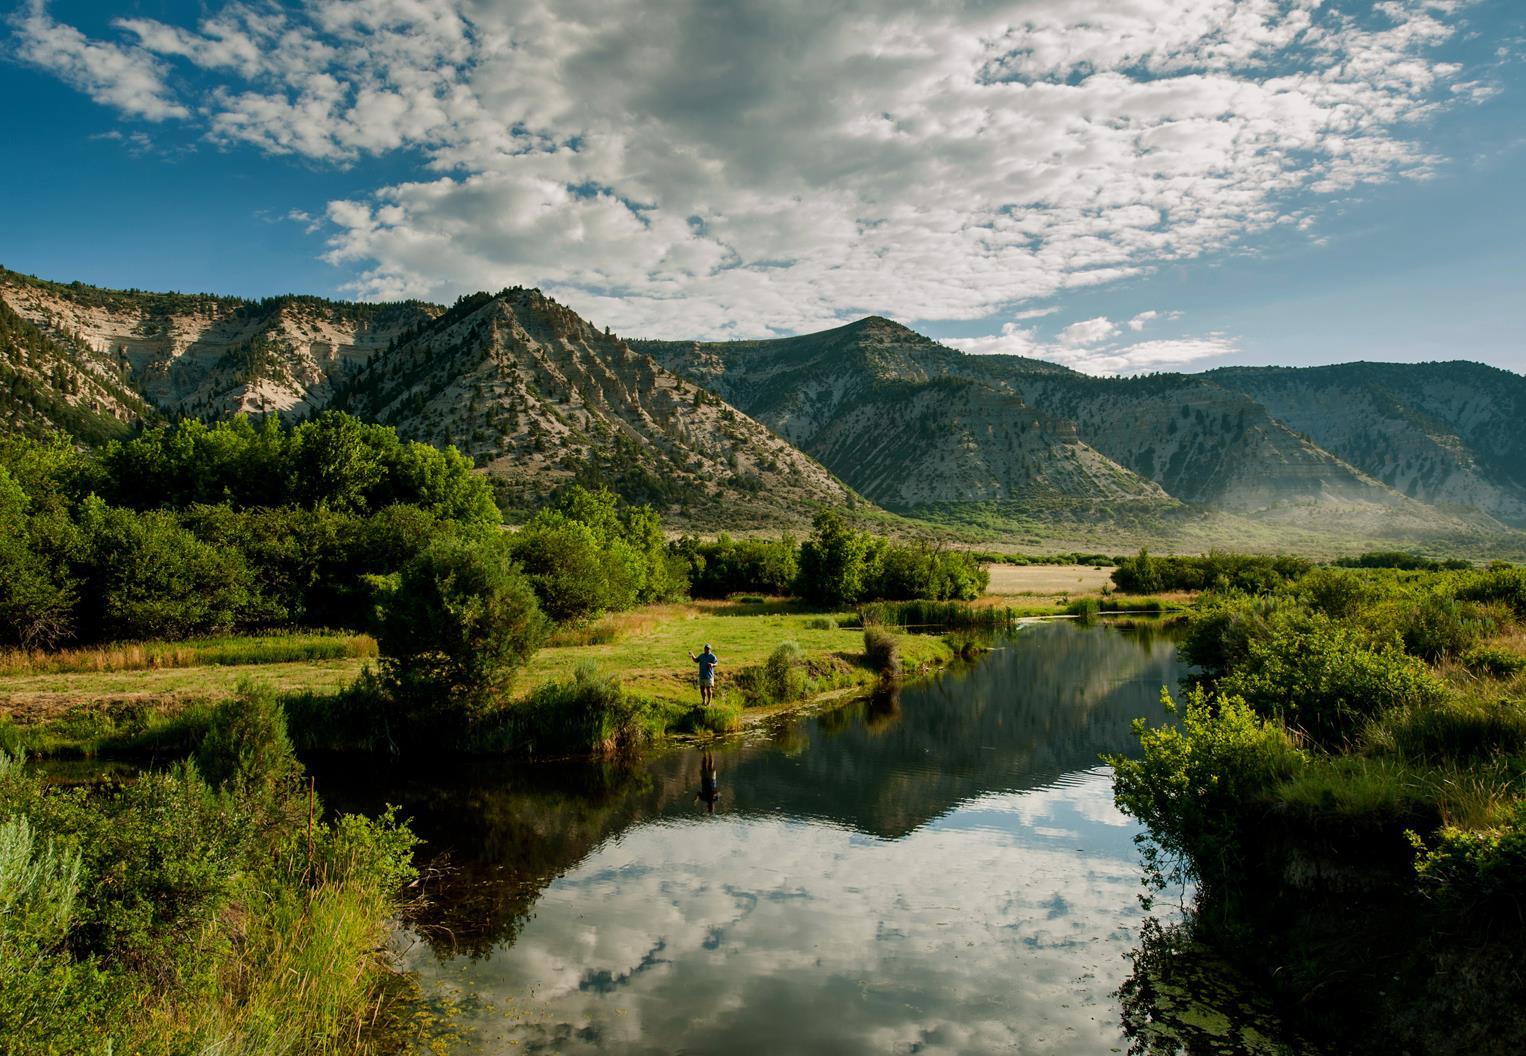 The High Lonesome Colorado dude ranch